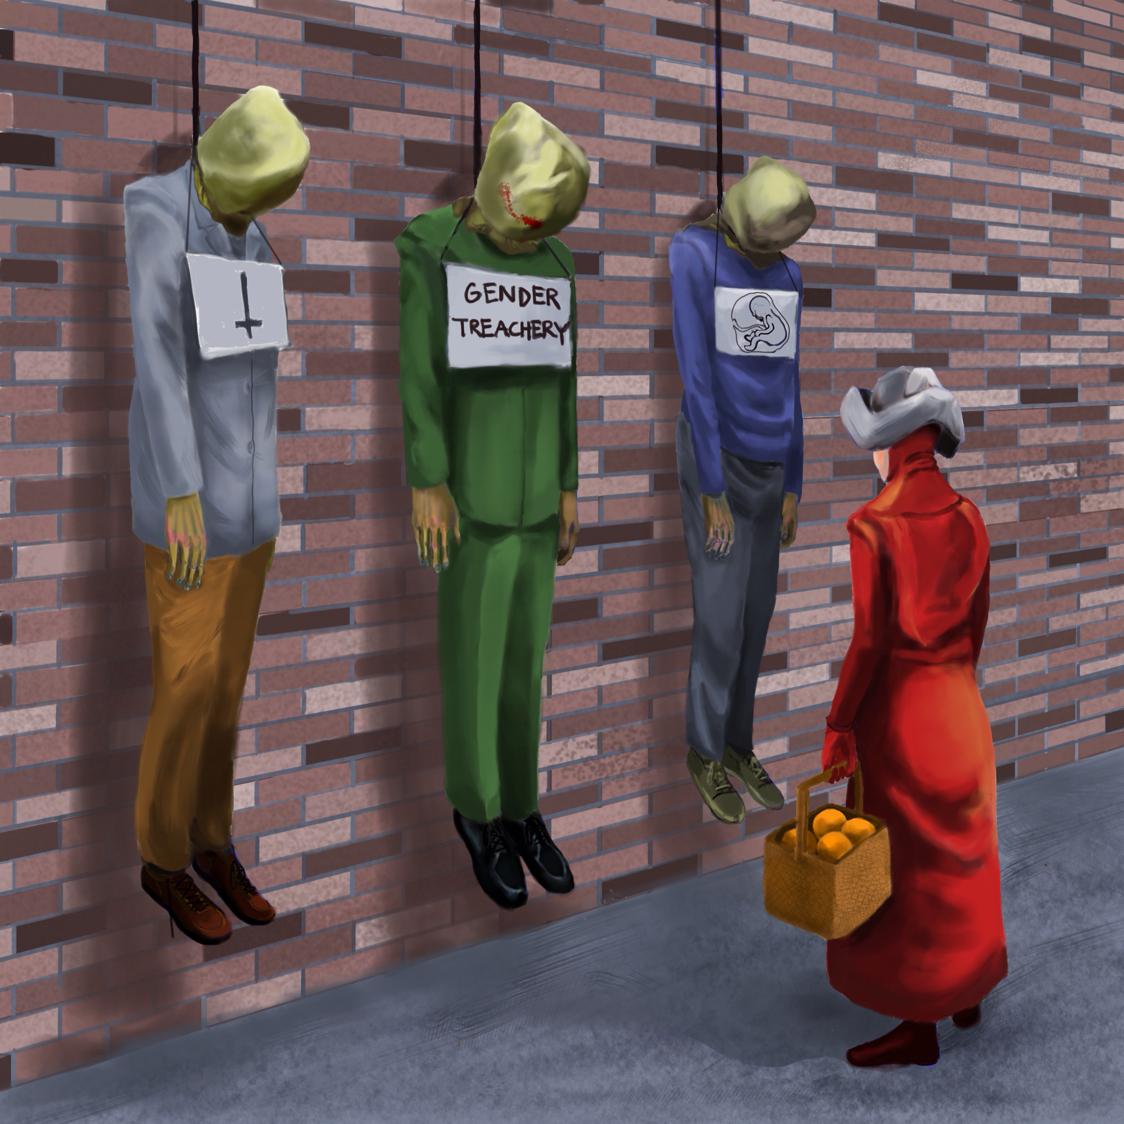 The Handmaids Tale By Nadene Preciado